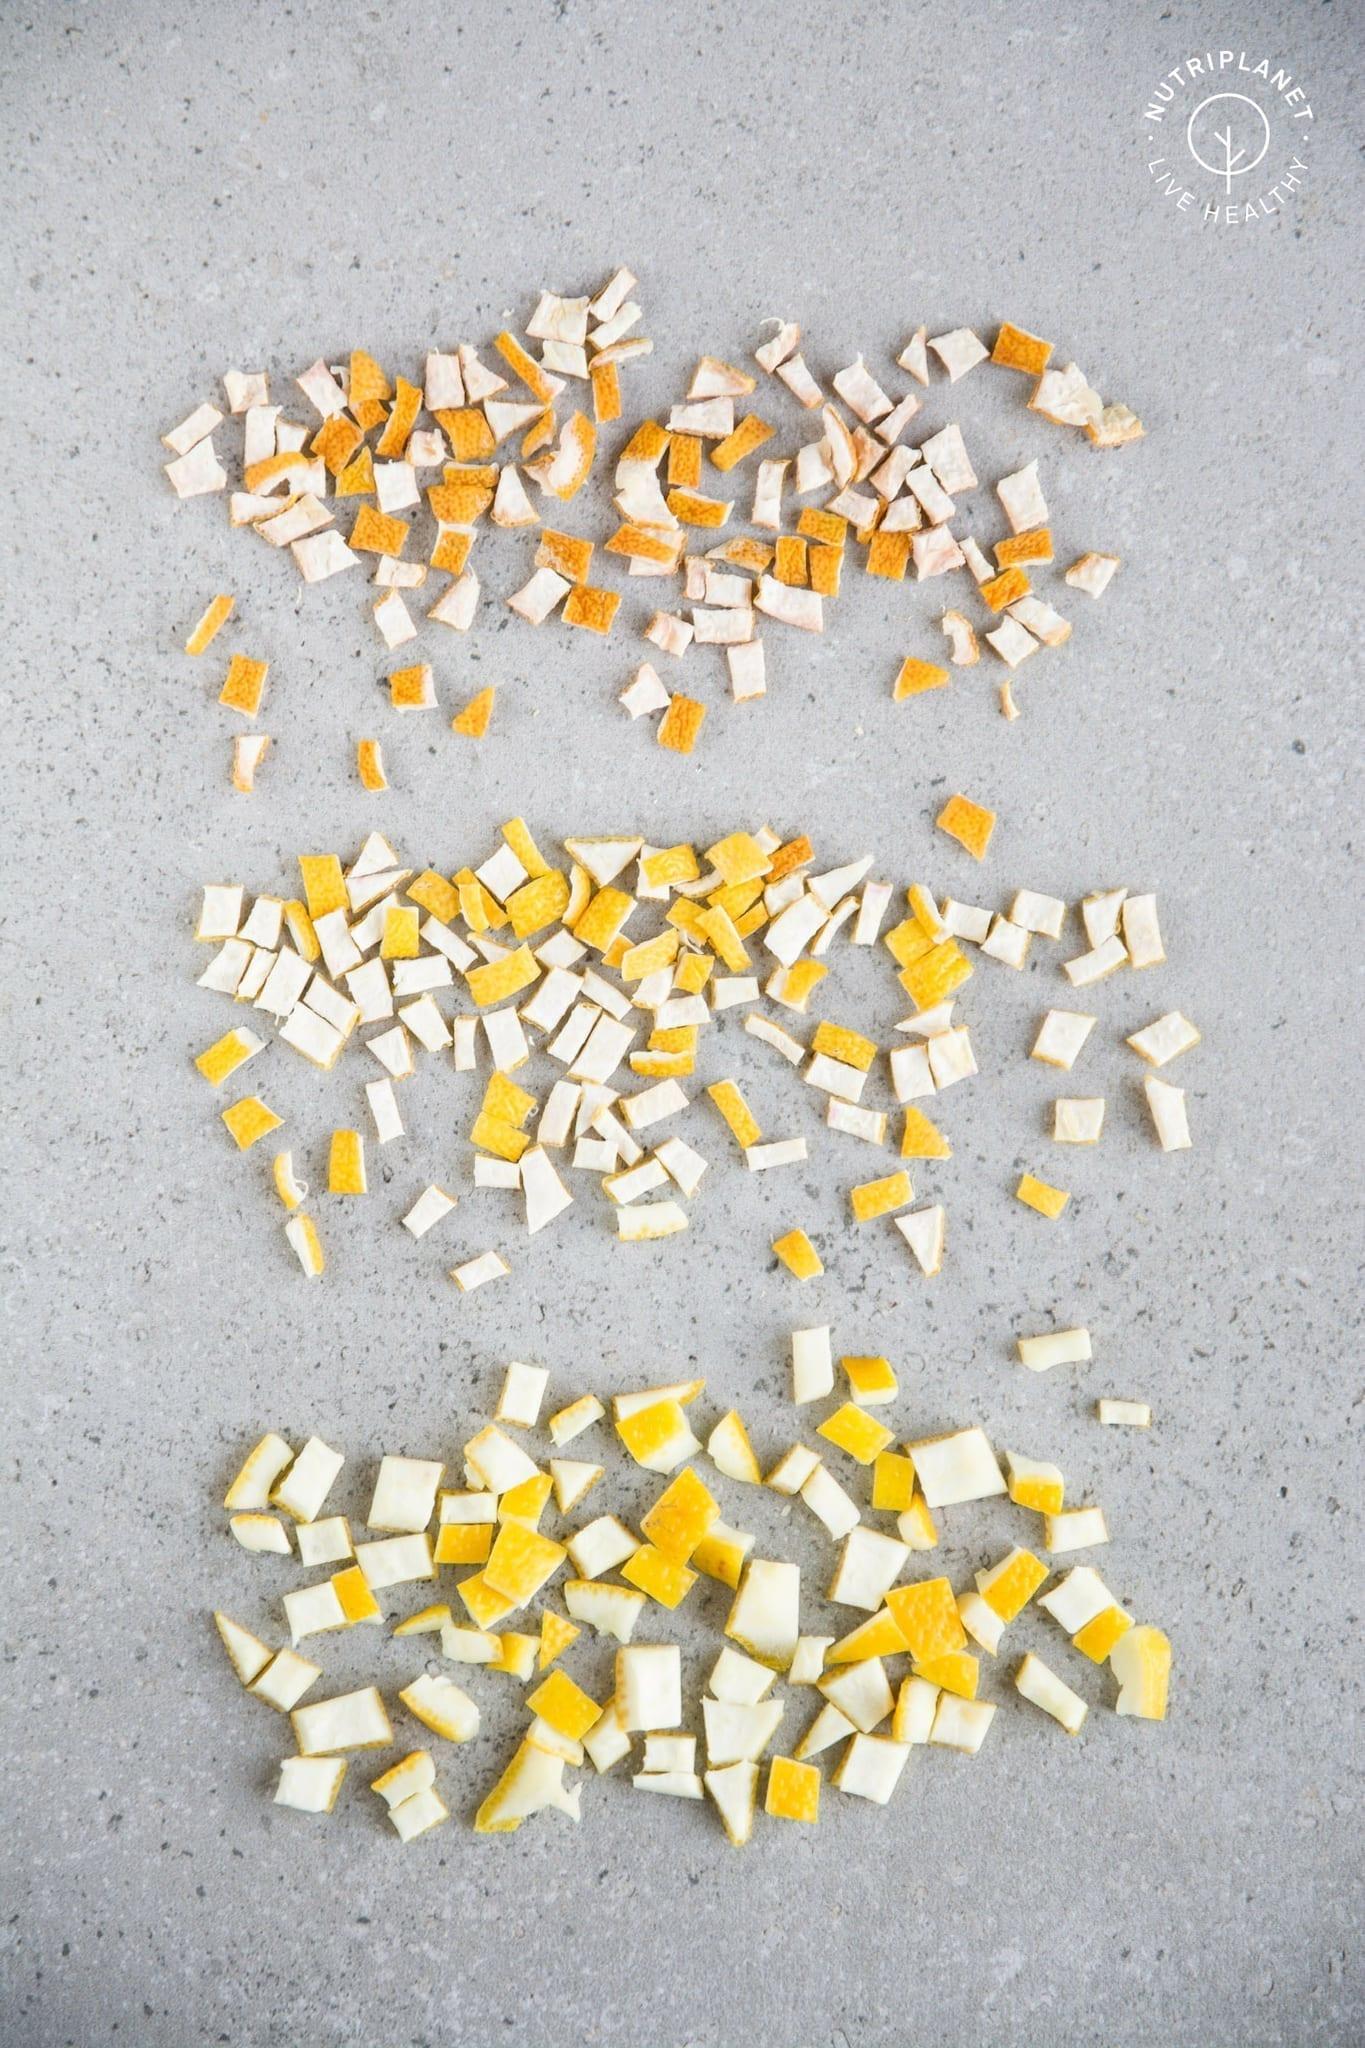 Dried Lemon Peel Powder